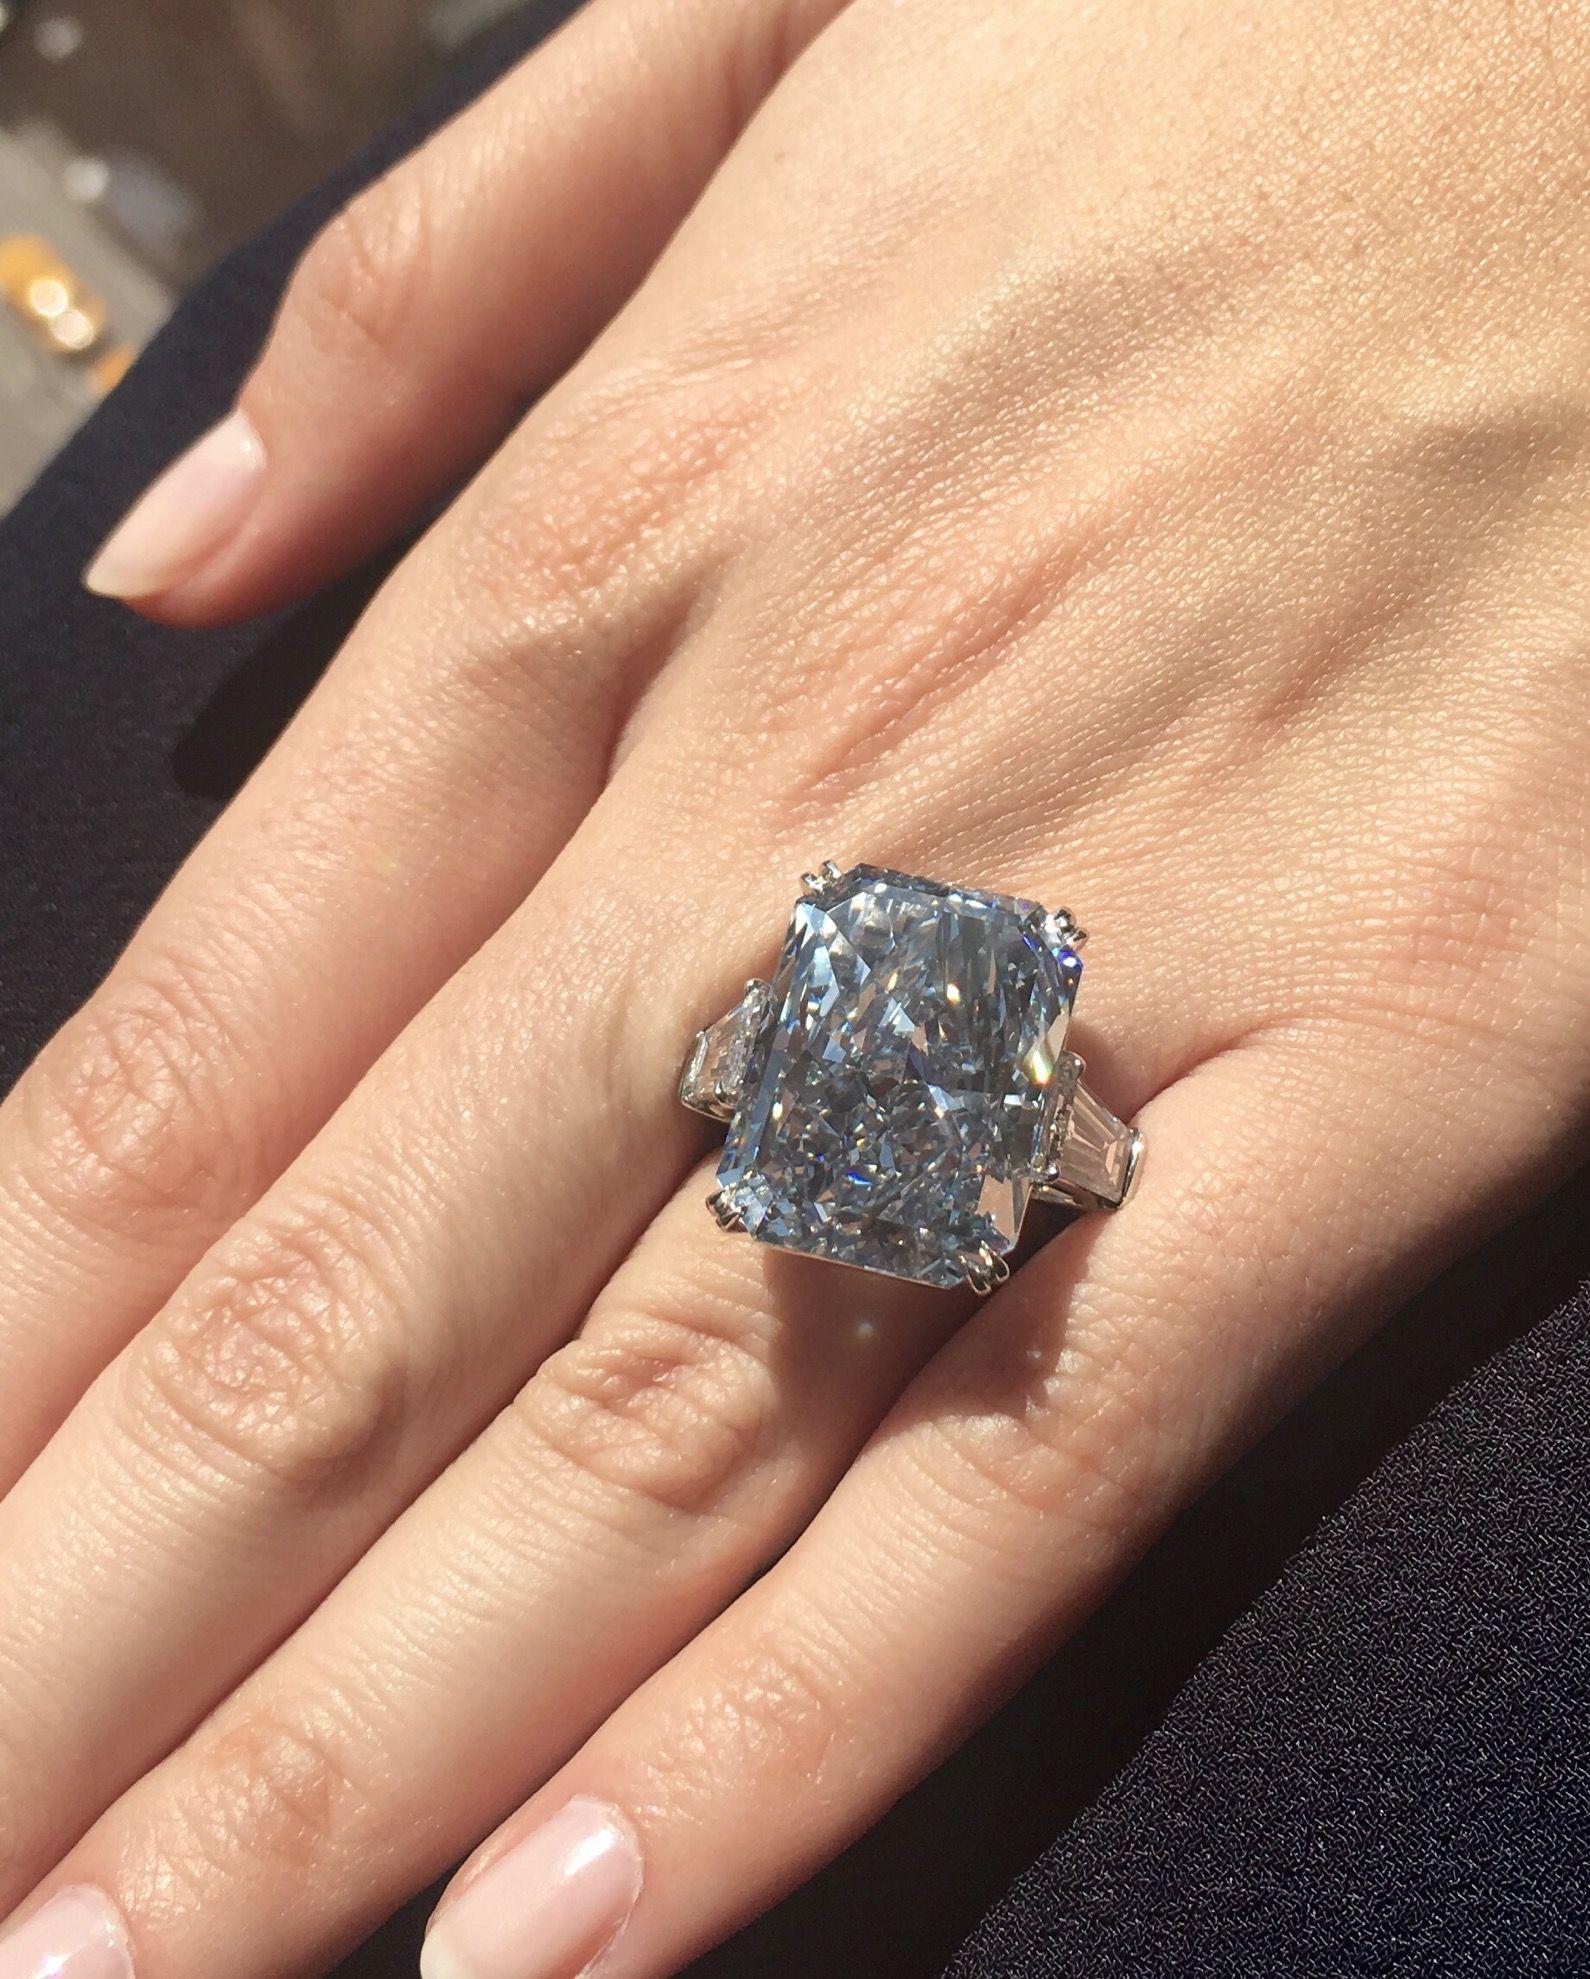 The 24carat Cullinan Dream: The Largest Fancy Intense Blue Diamond Toe  To